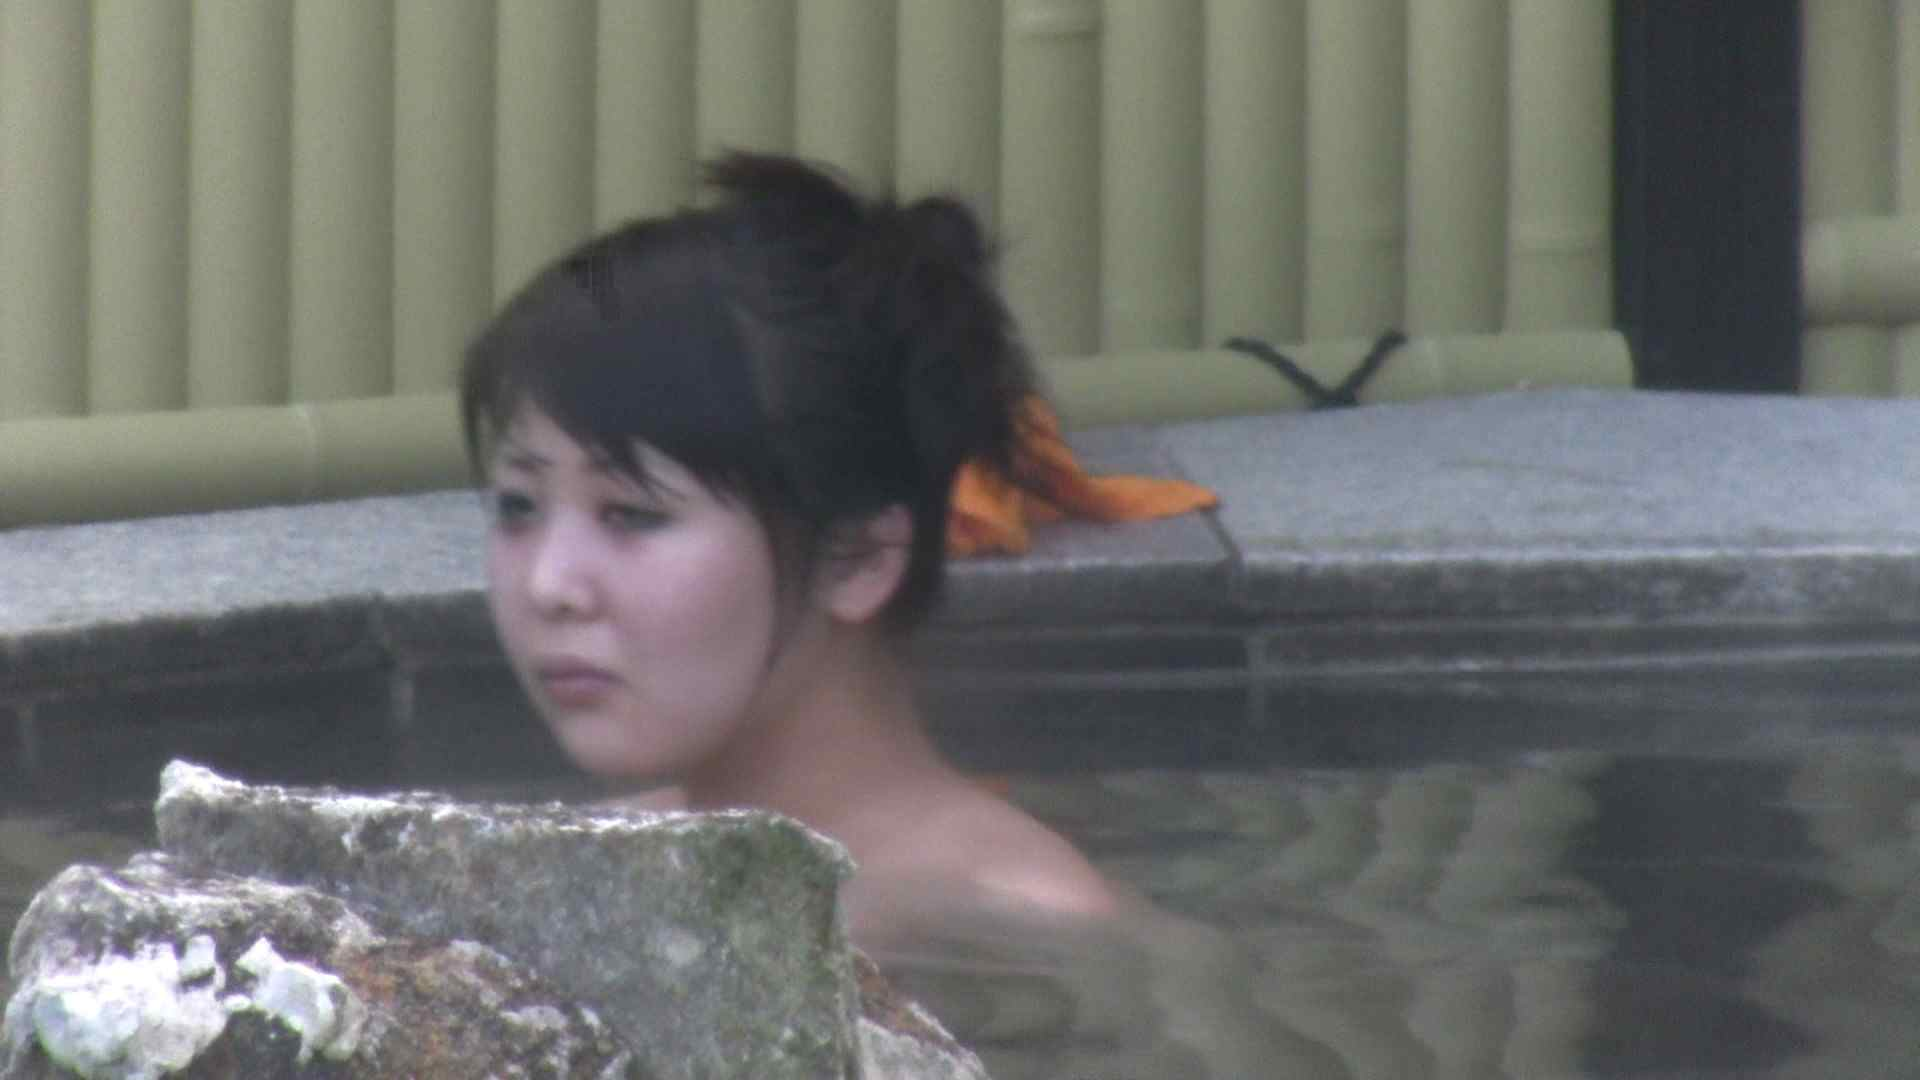 Aquaな露天風呂Vol.118 女体盗撮 隠し撮りAV無料 68連発 38